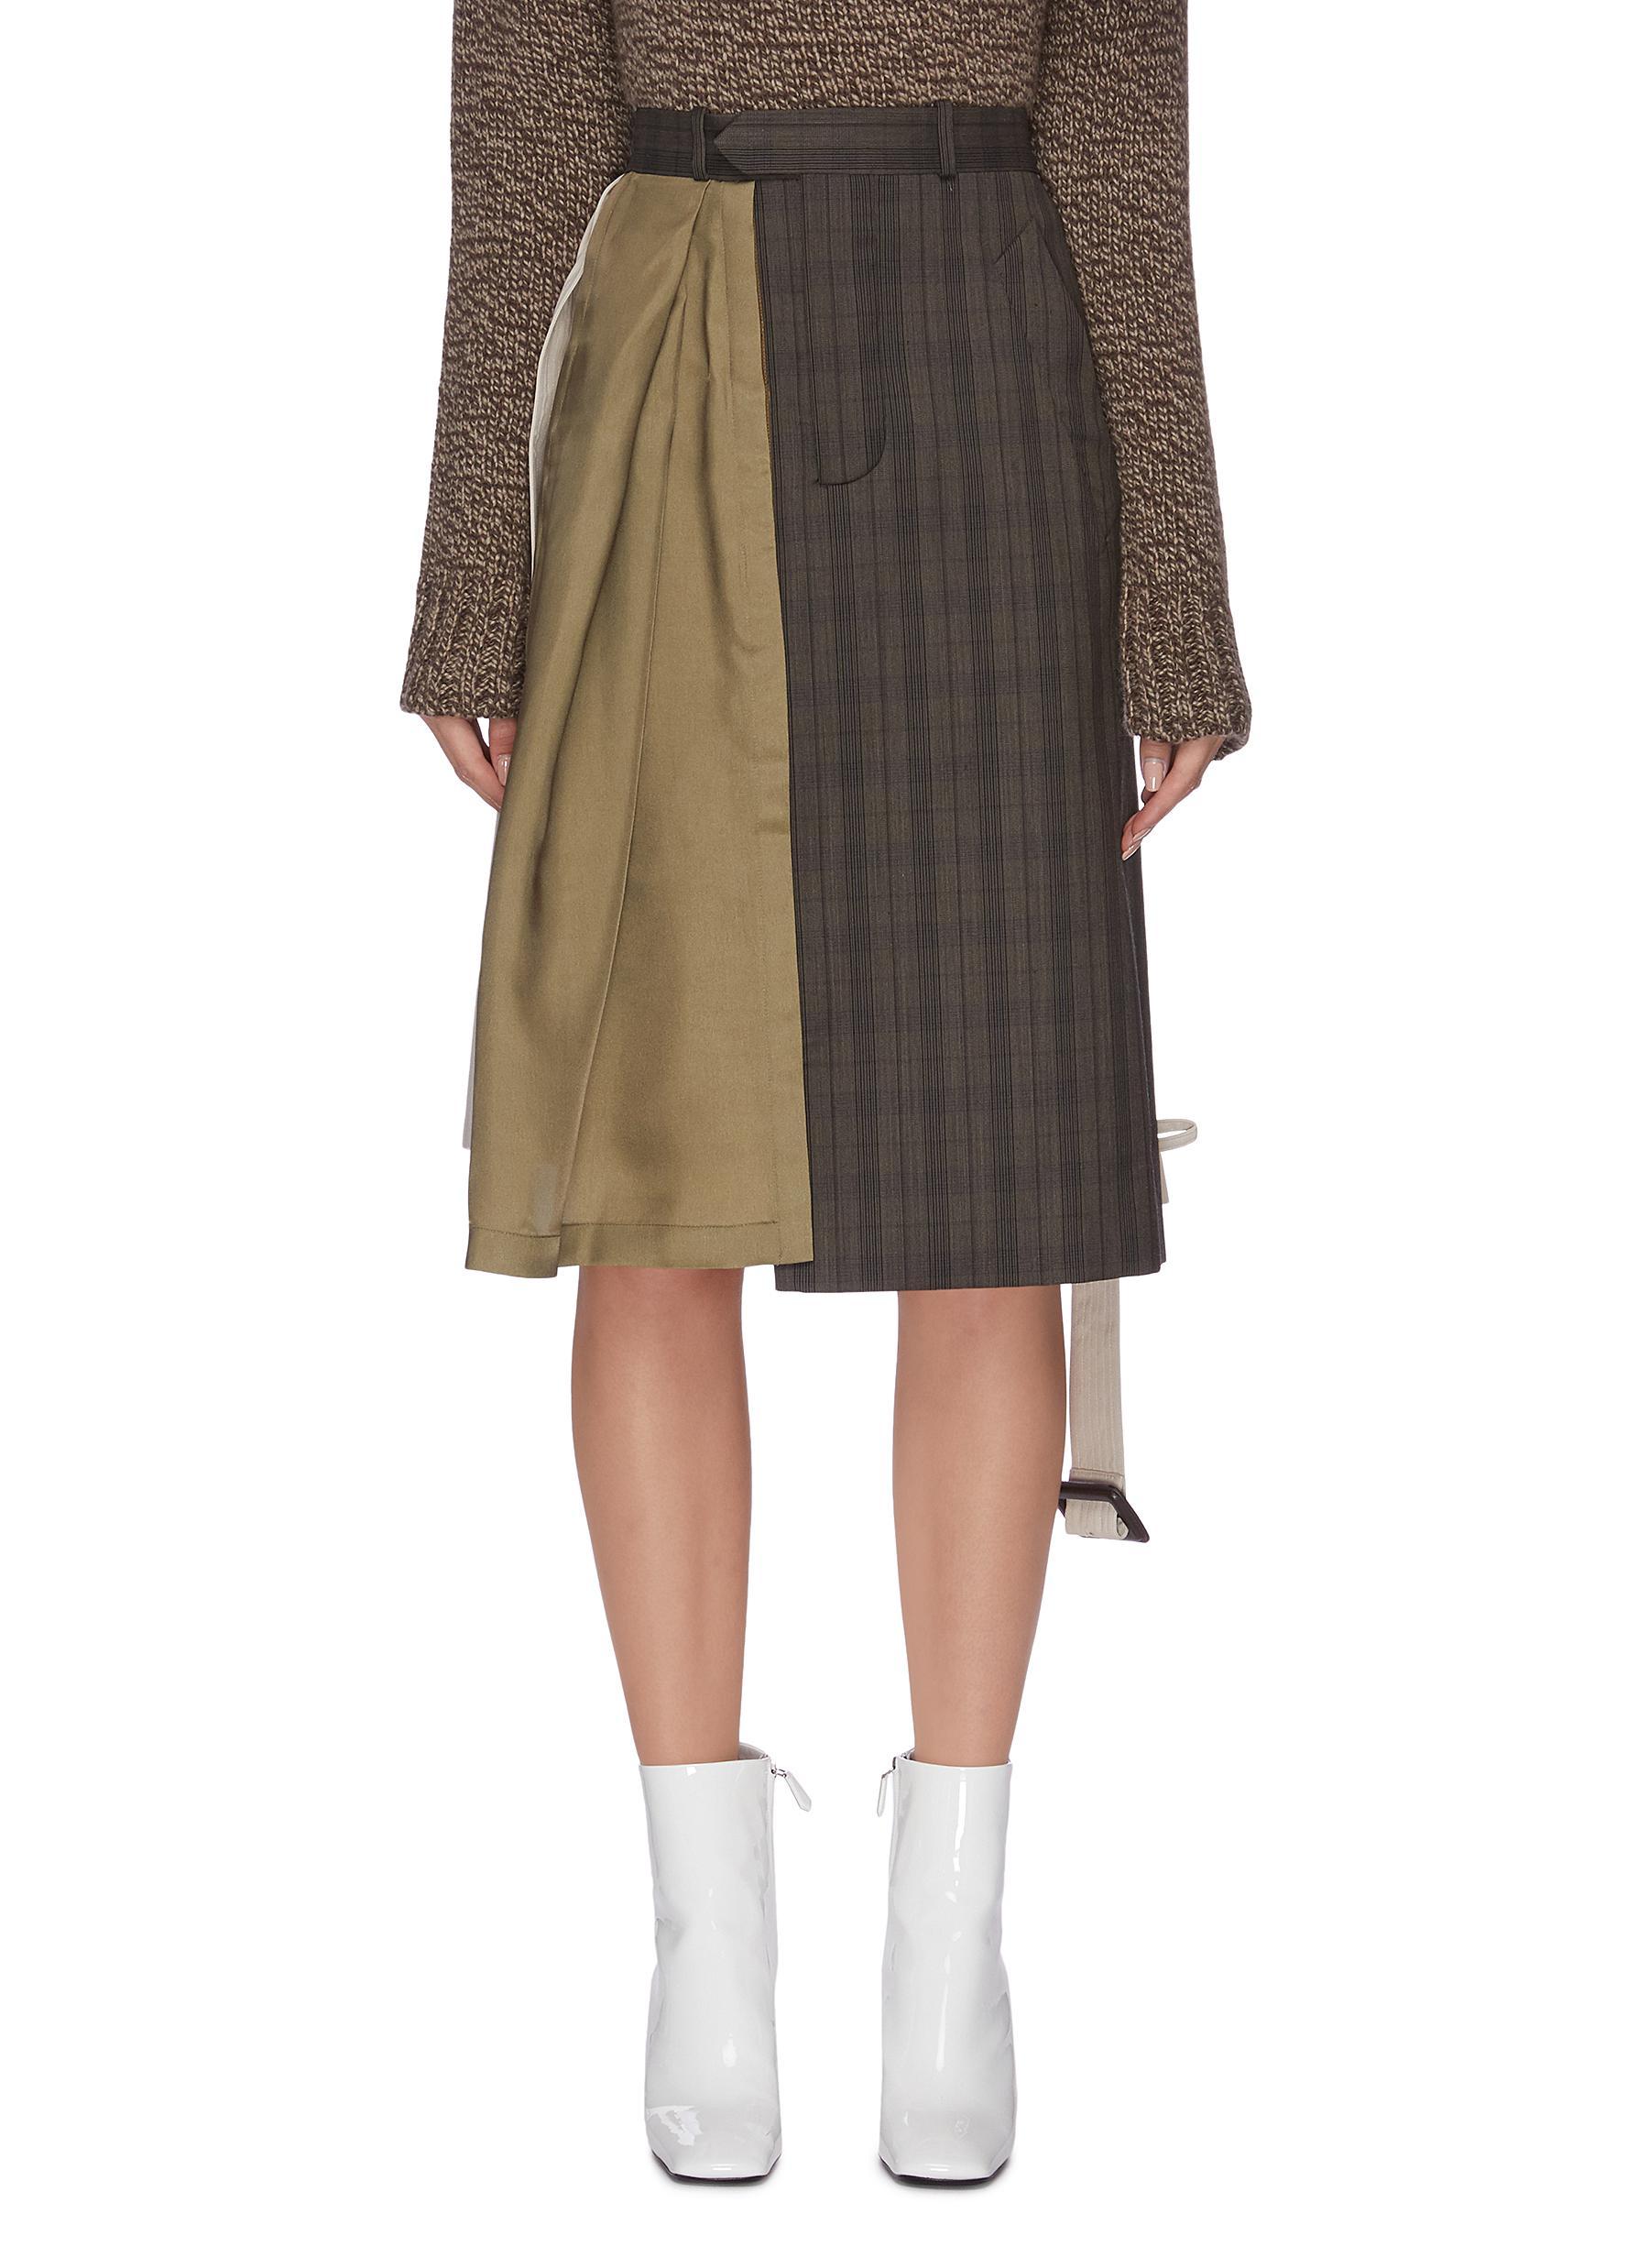 Patchwork check plaid trench midi dress by Maison Margiela